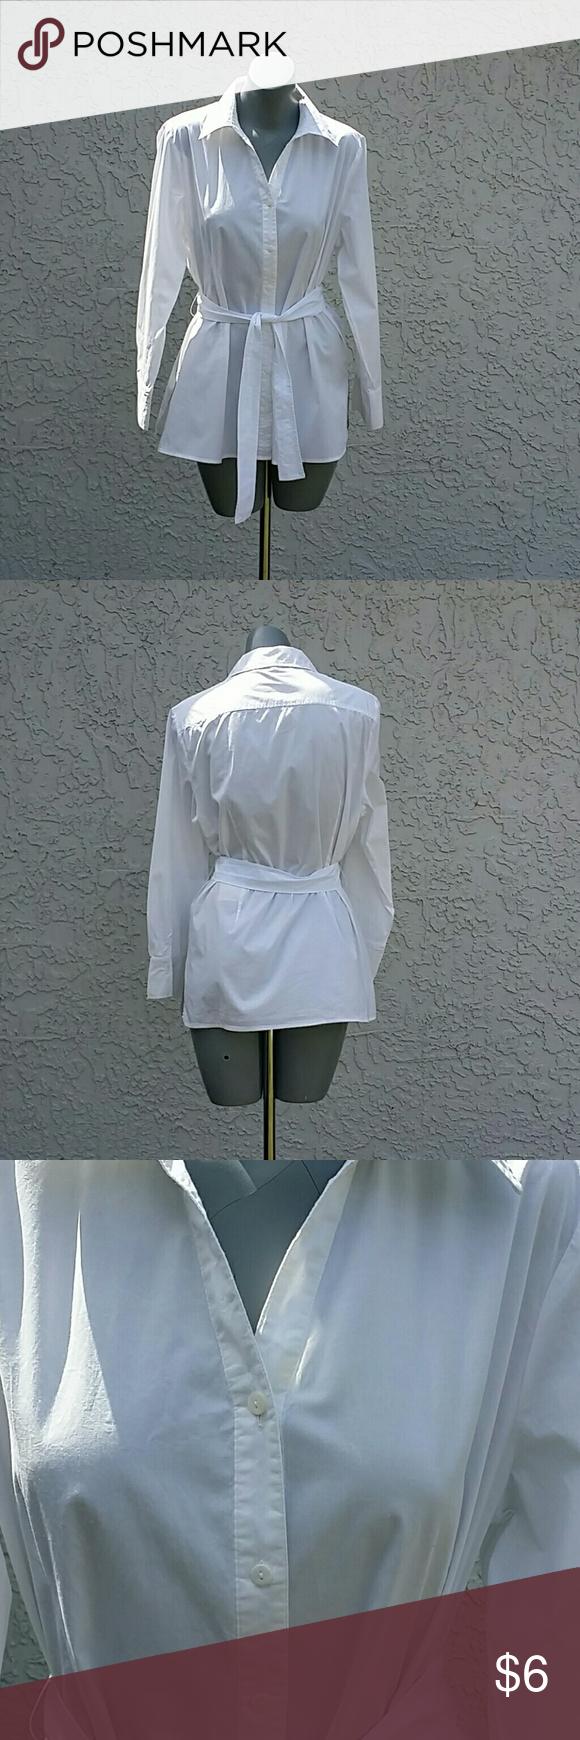 White Top White Top Peck & Peck  Tops Button Down Shirts